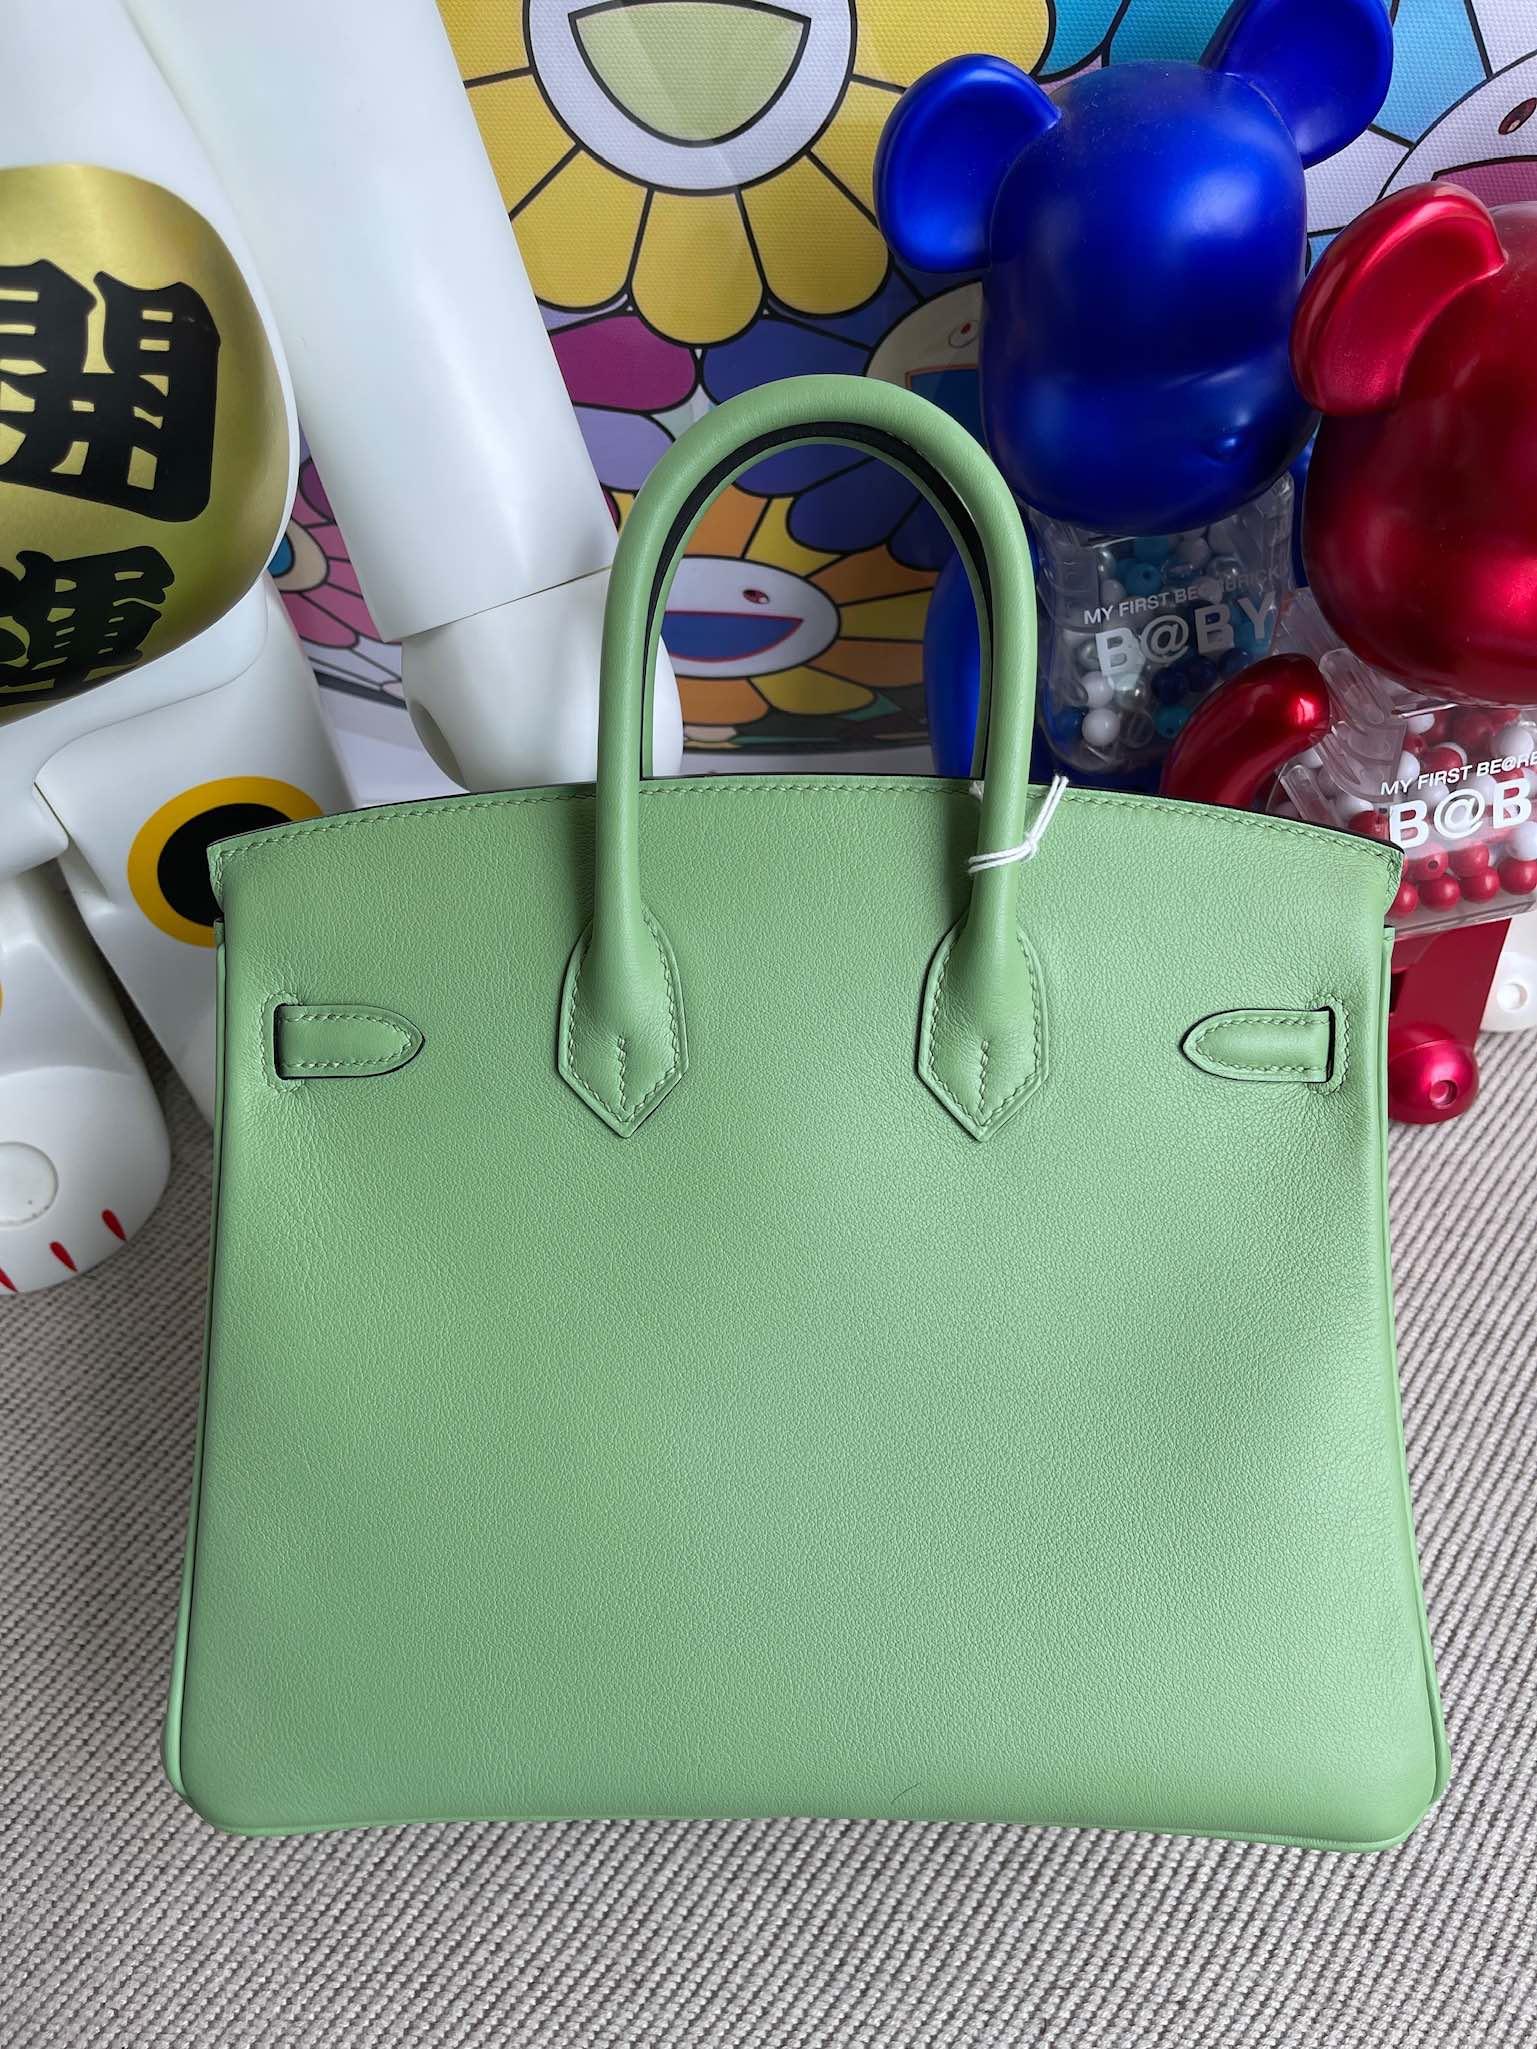 Hermès(爱马仕)Birkin 铂金包 swift 3I 牛油果绿 银扣 25cm 顶级手缝